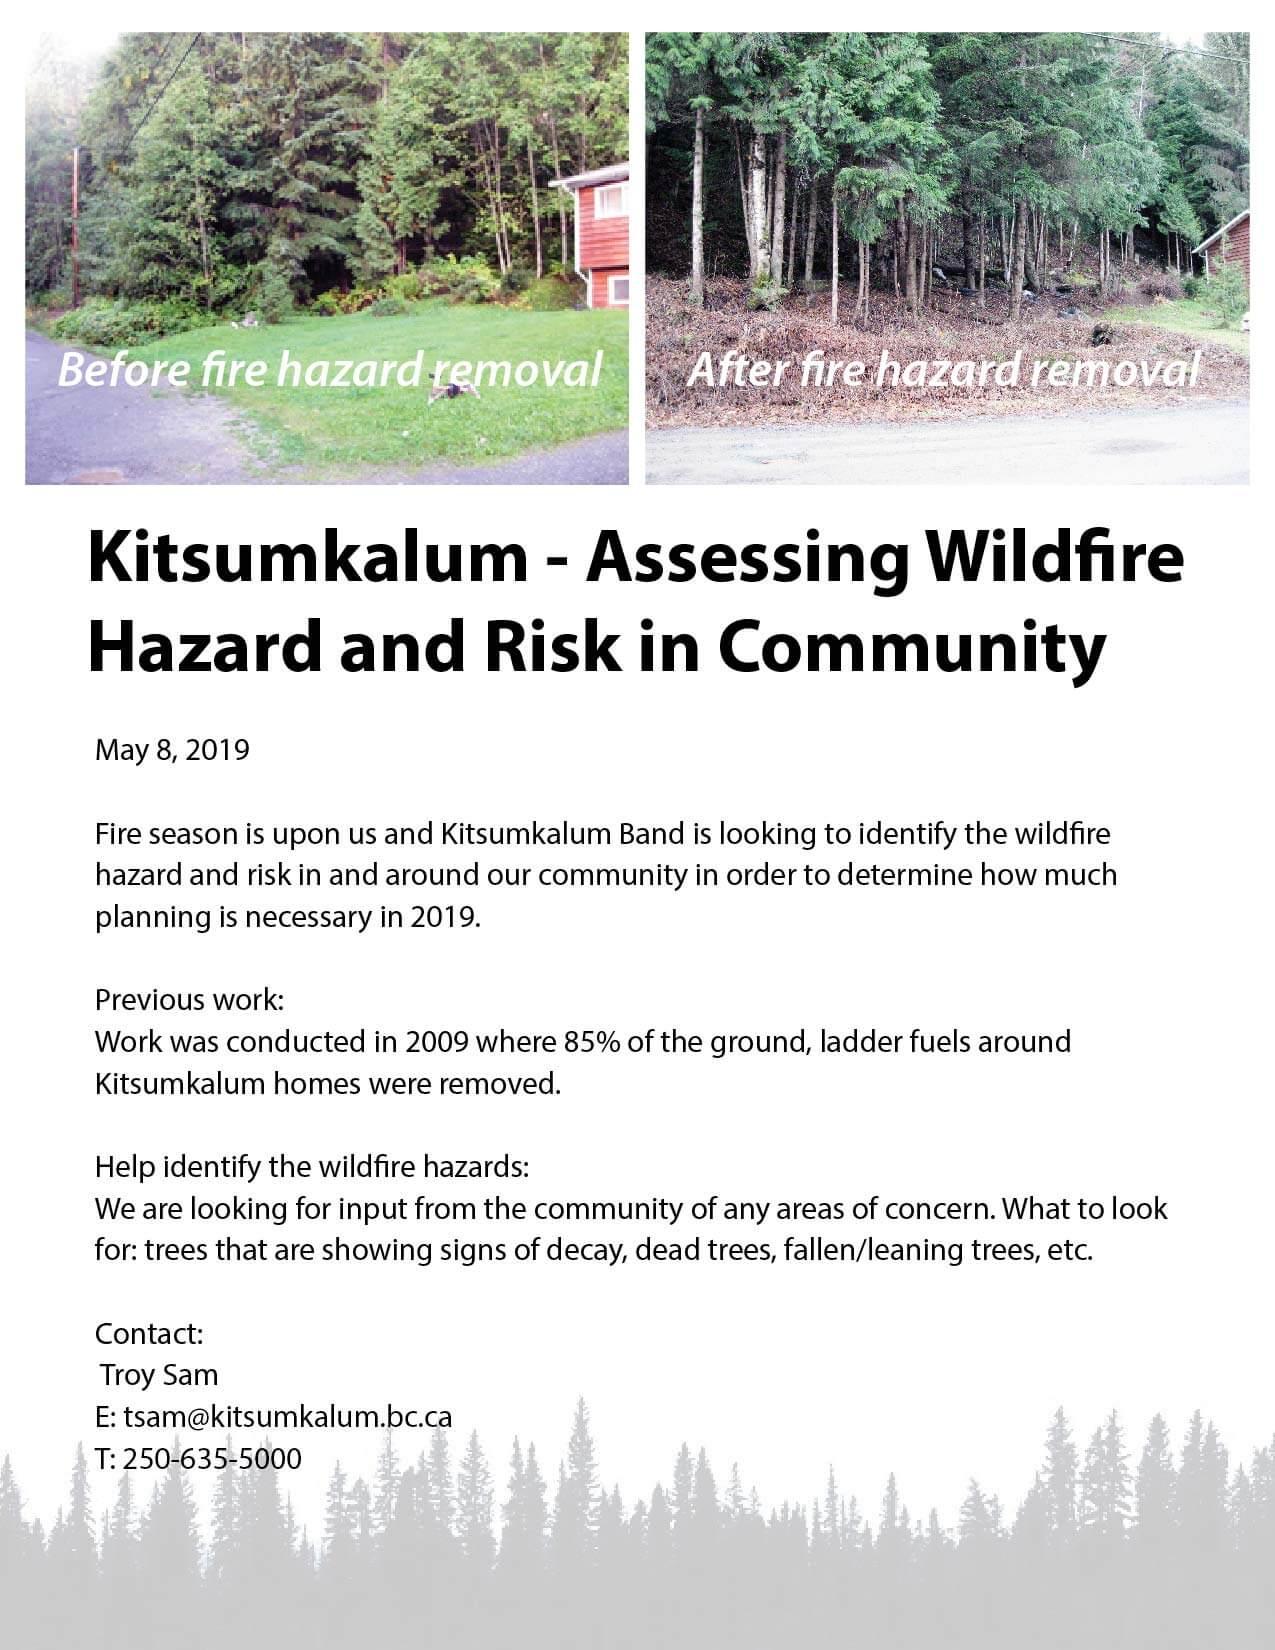 Call for Input – Kitsumkalum Assessing Fire Hazard and Risk in Community